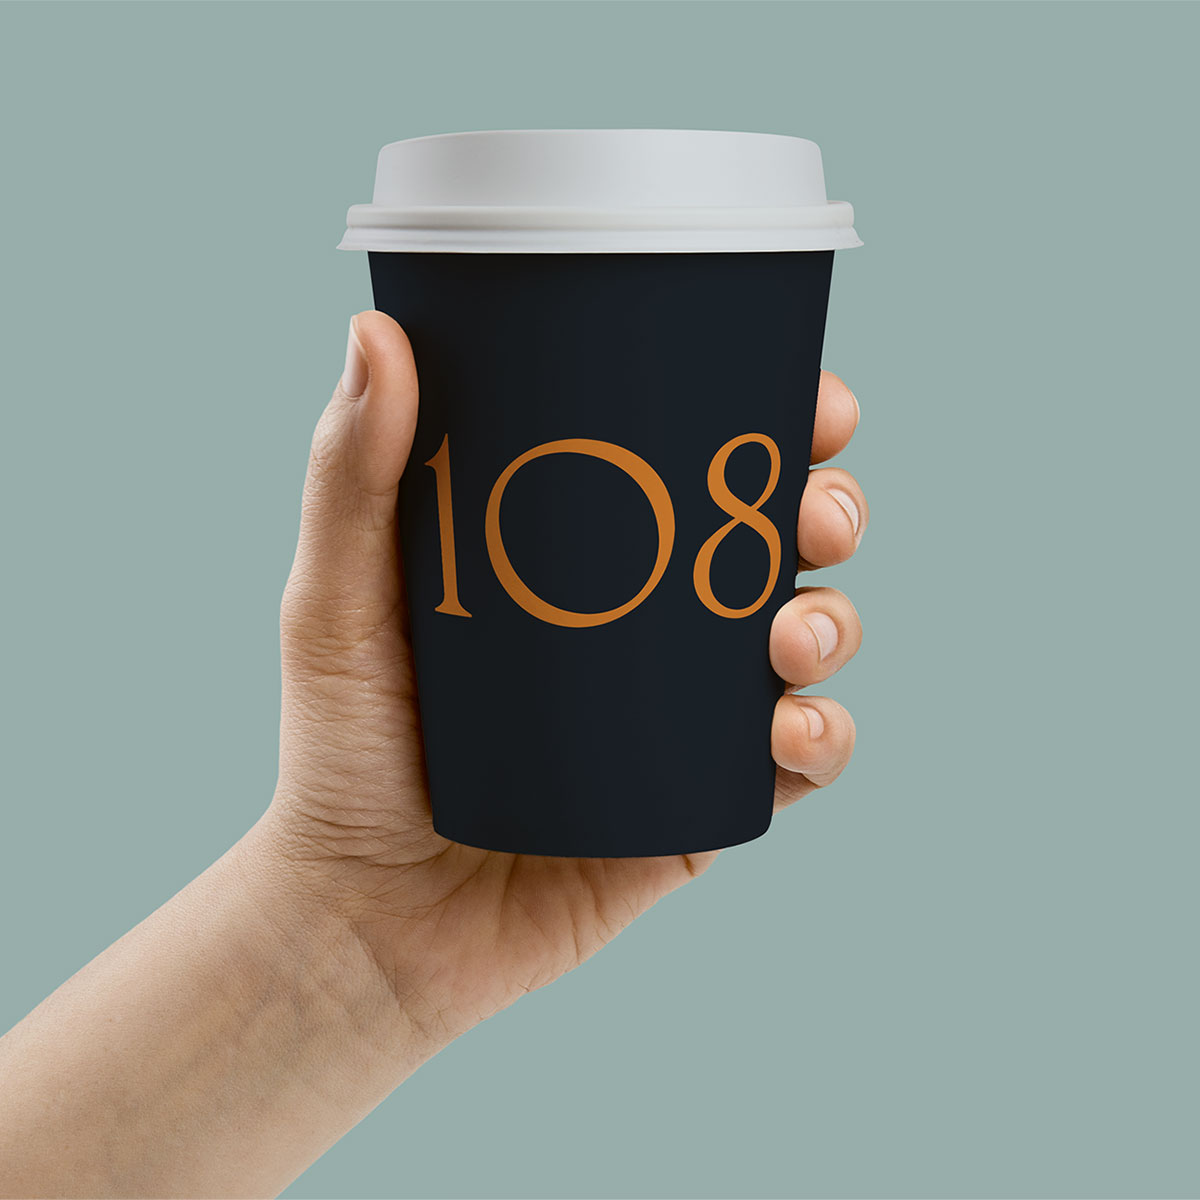 108_coffecup